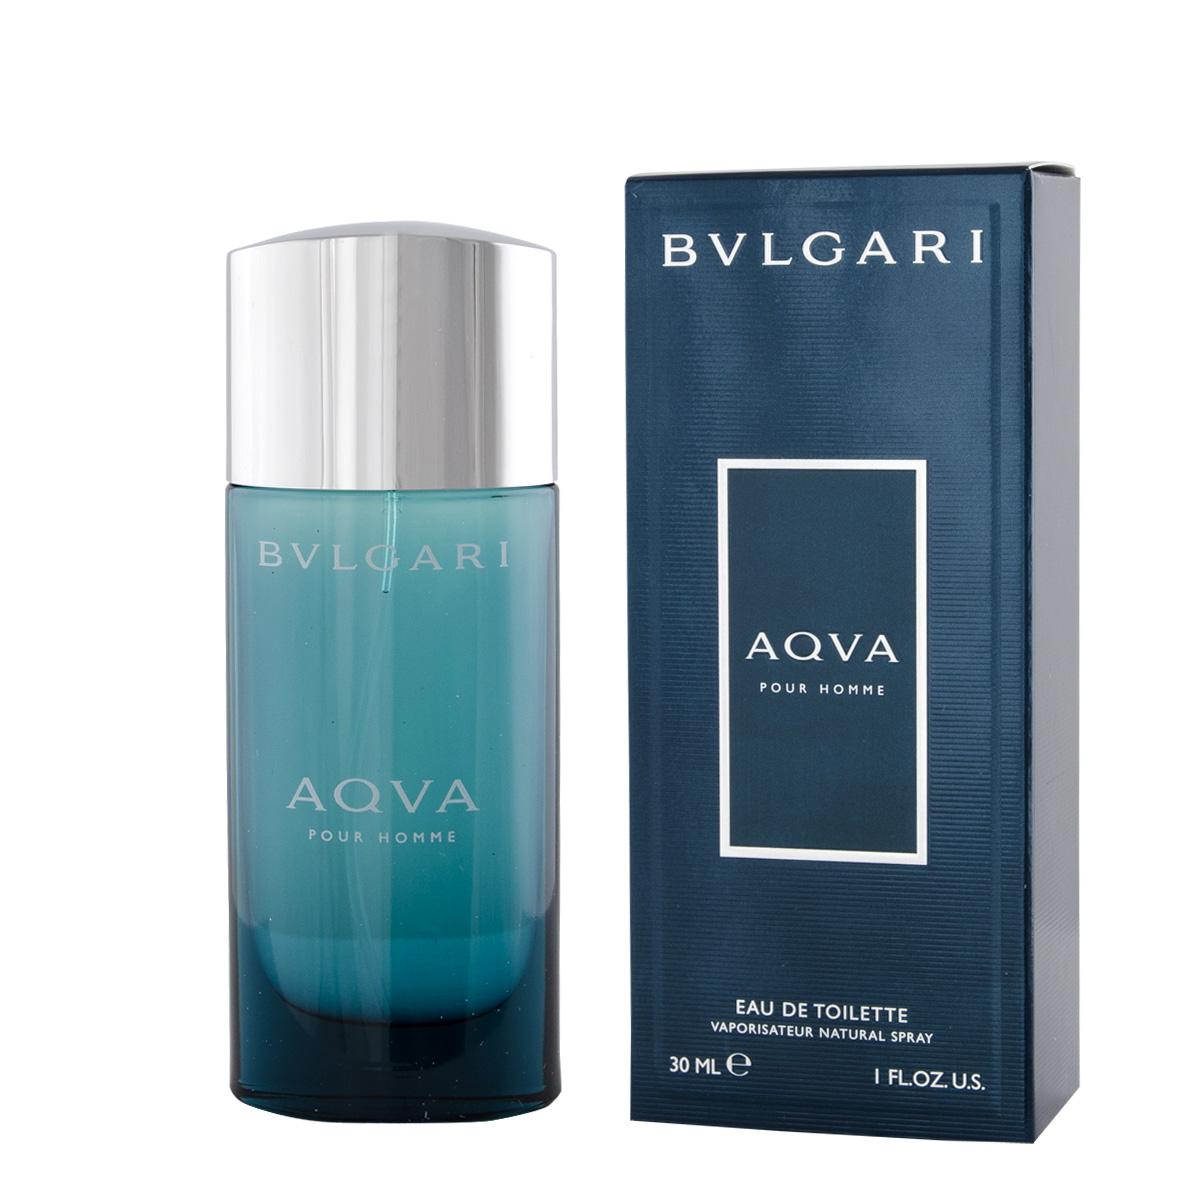 Bvlgari Aqva Pour Homme EDT 30 ml M